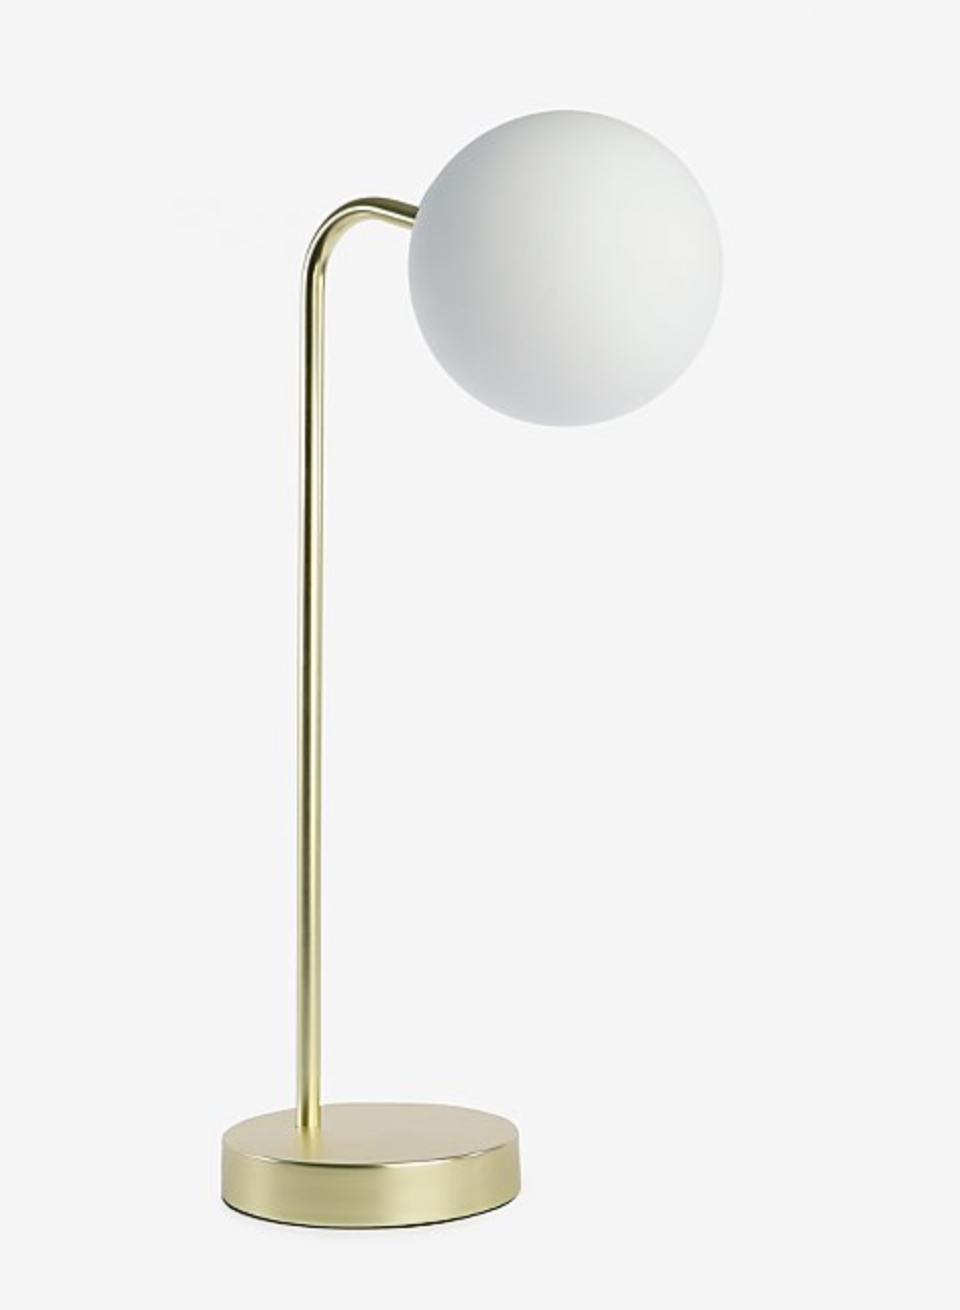 Gold Effect Curved Desk Lamp - £20